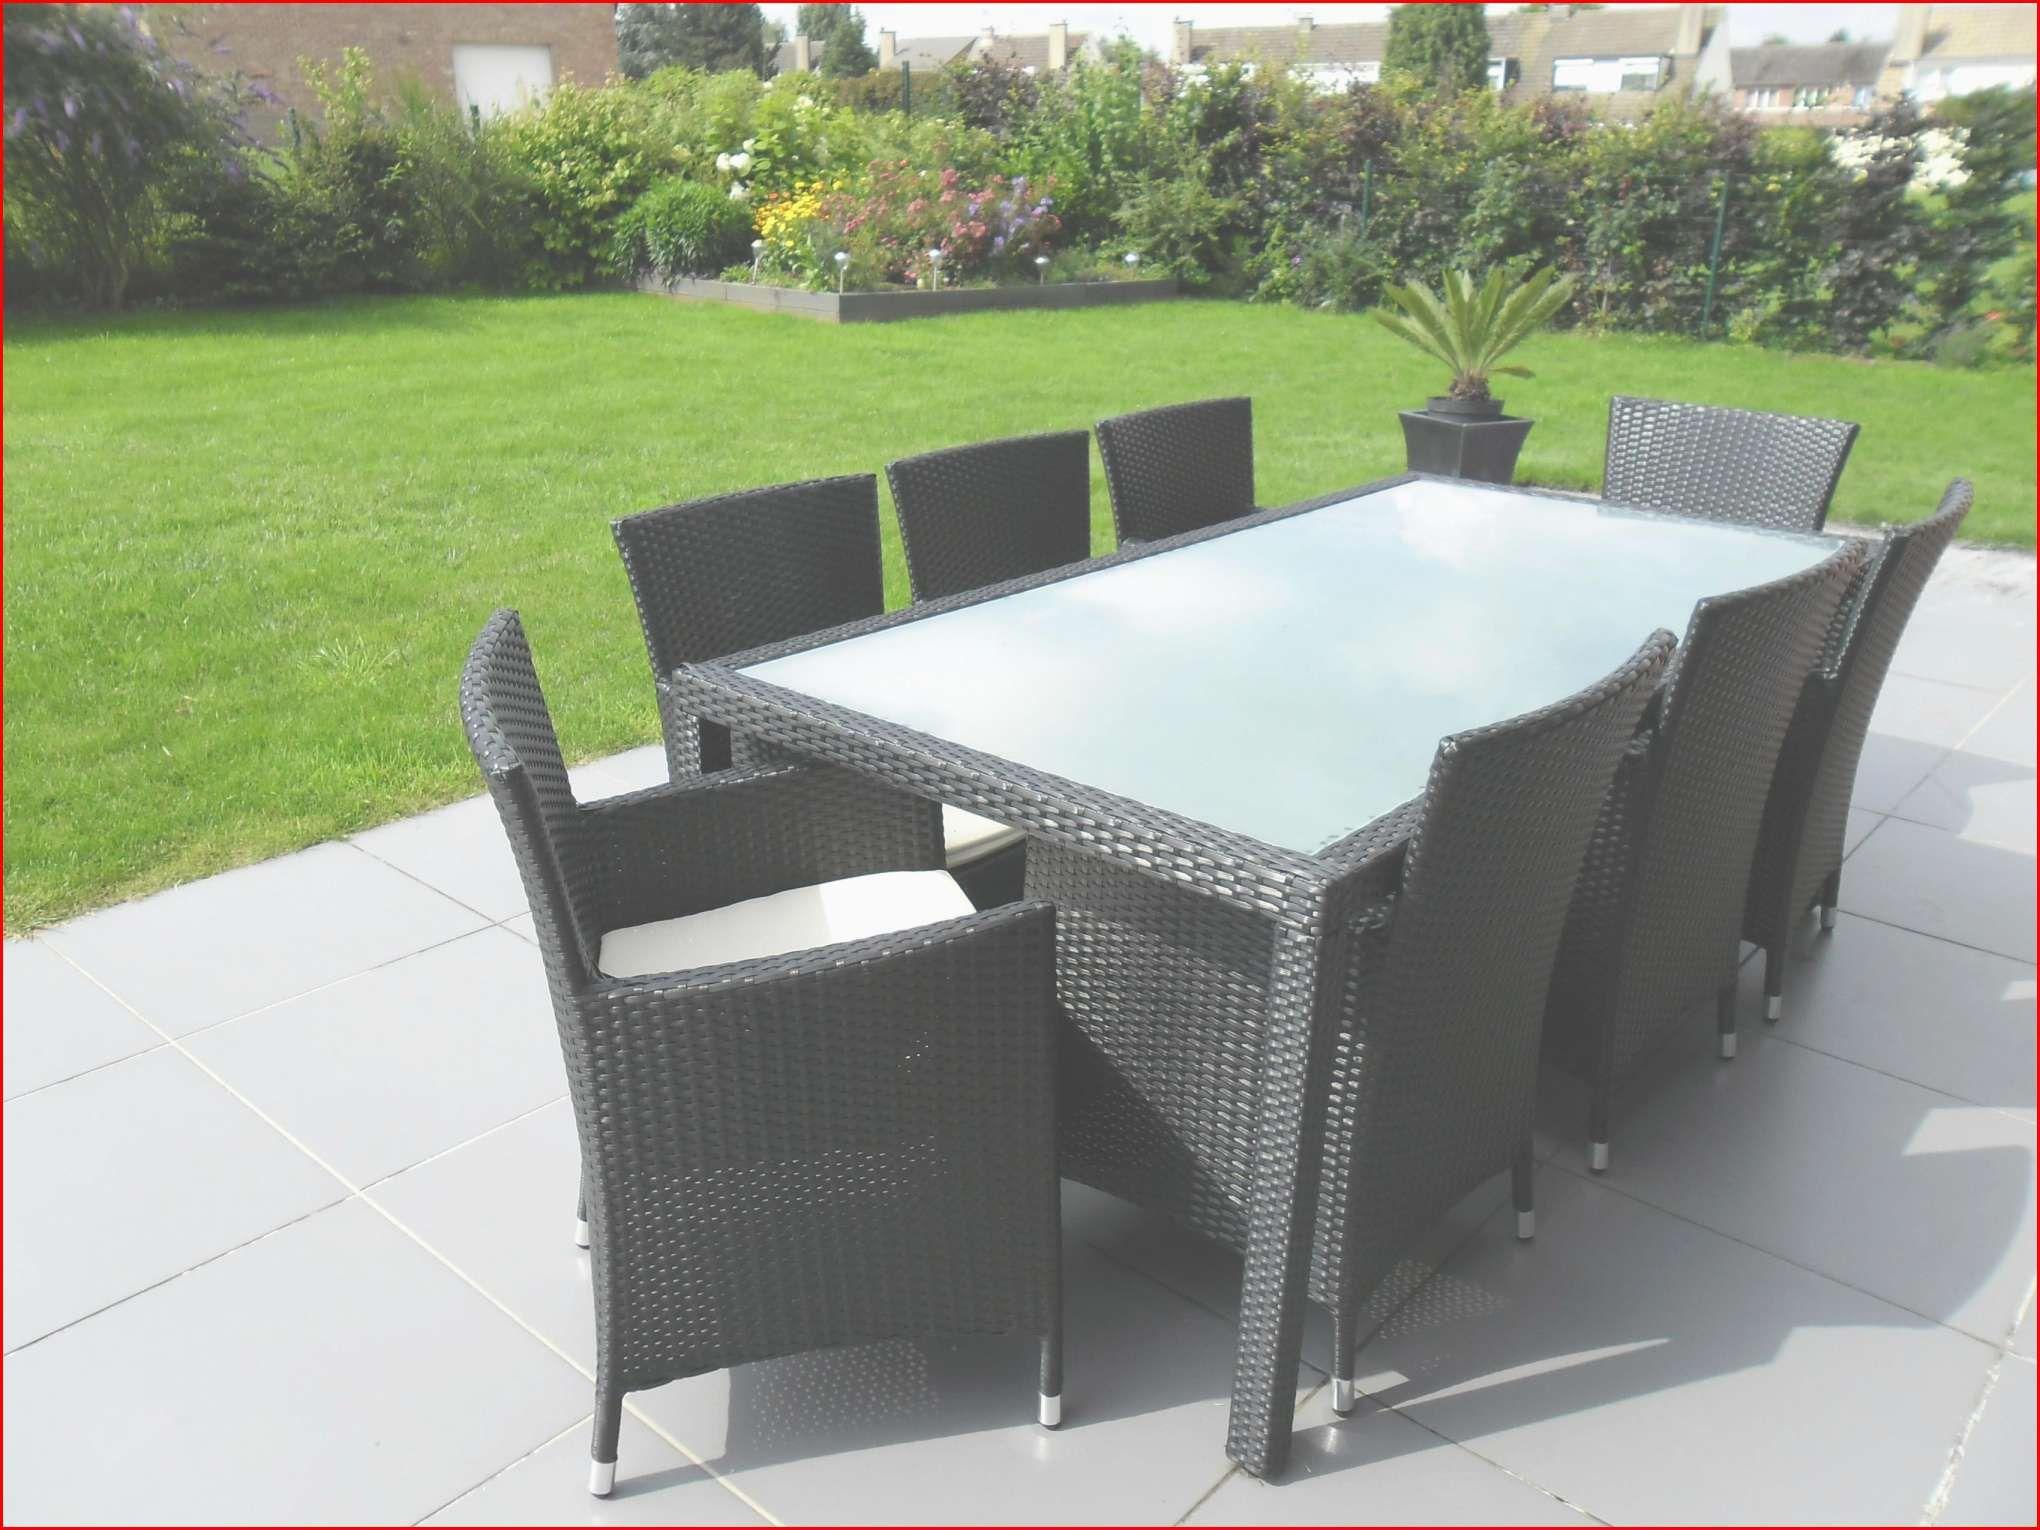 Pin On Home Design Ideas Serapportanta Table De Jardin Auchan